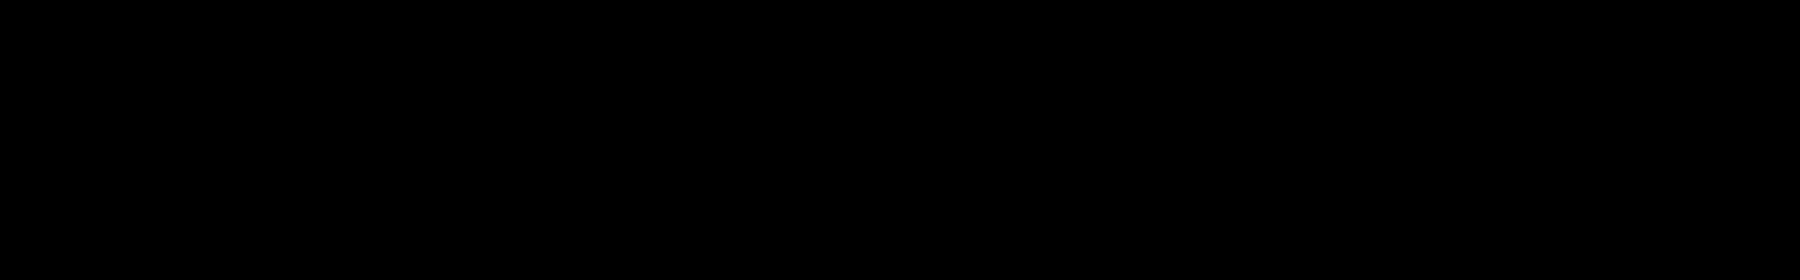 Devinci audio waveform